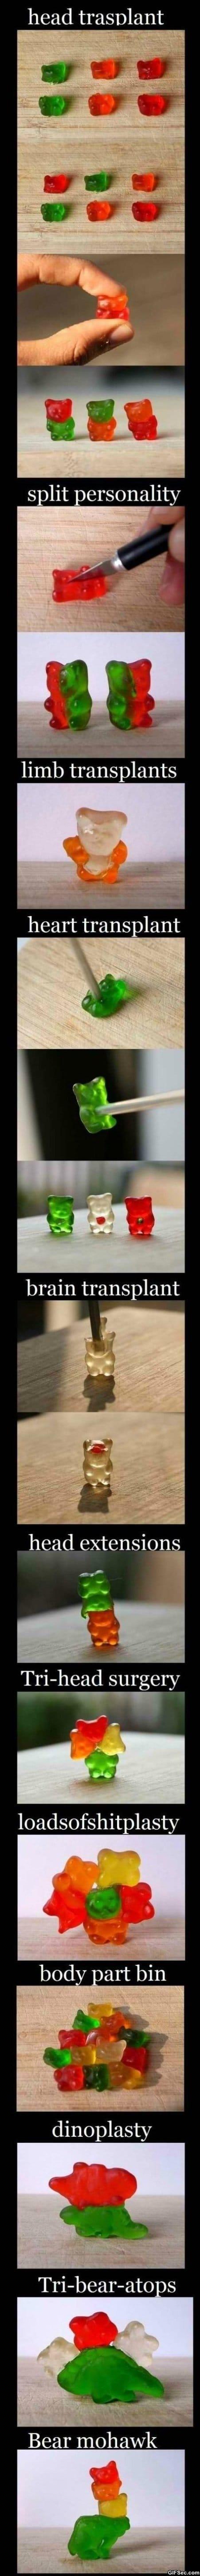 fun-stuff-to-do-with-gumy-bears